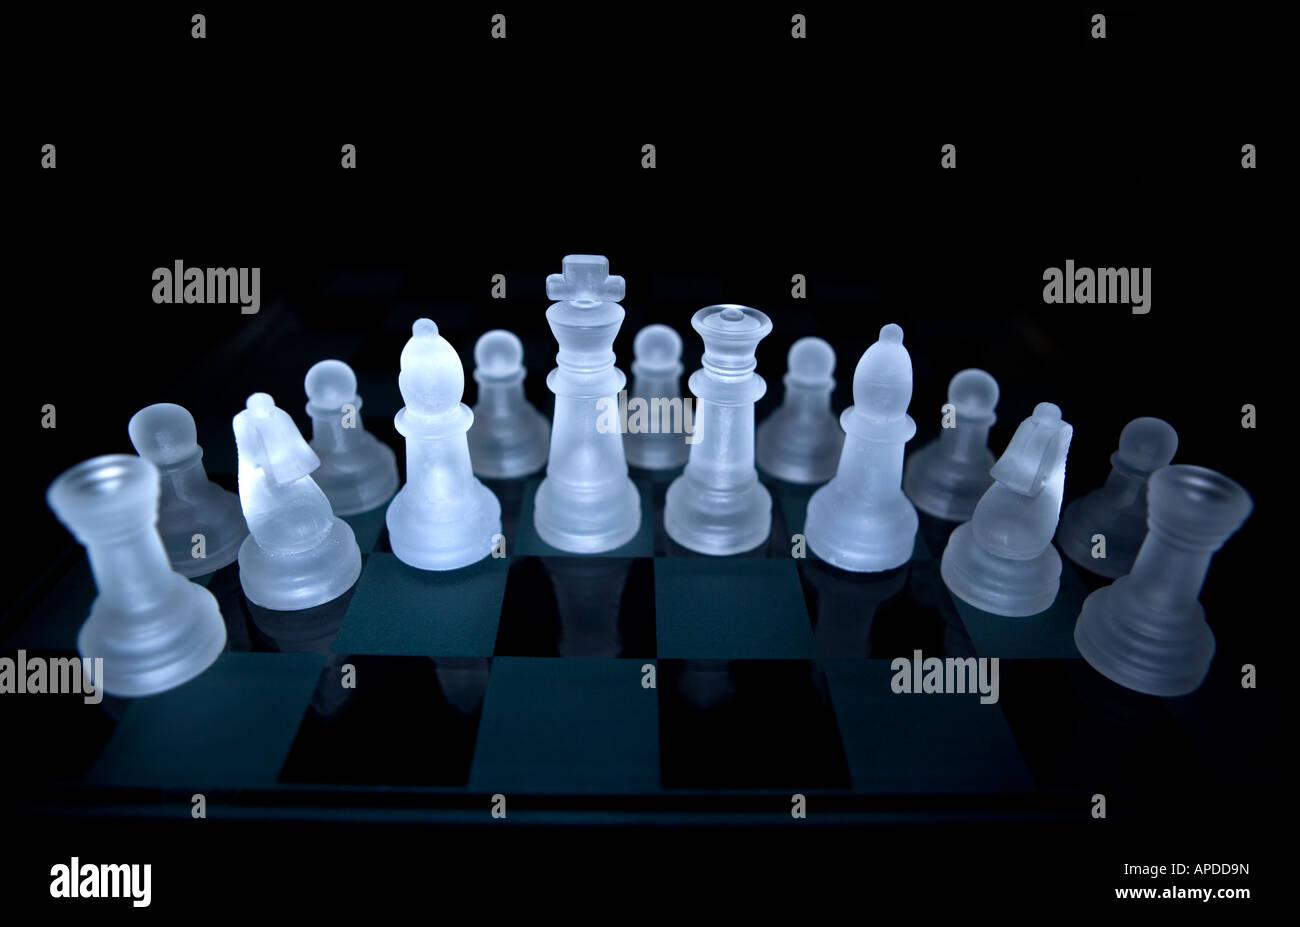 chess set black & white on chess table - Stock Image